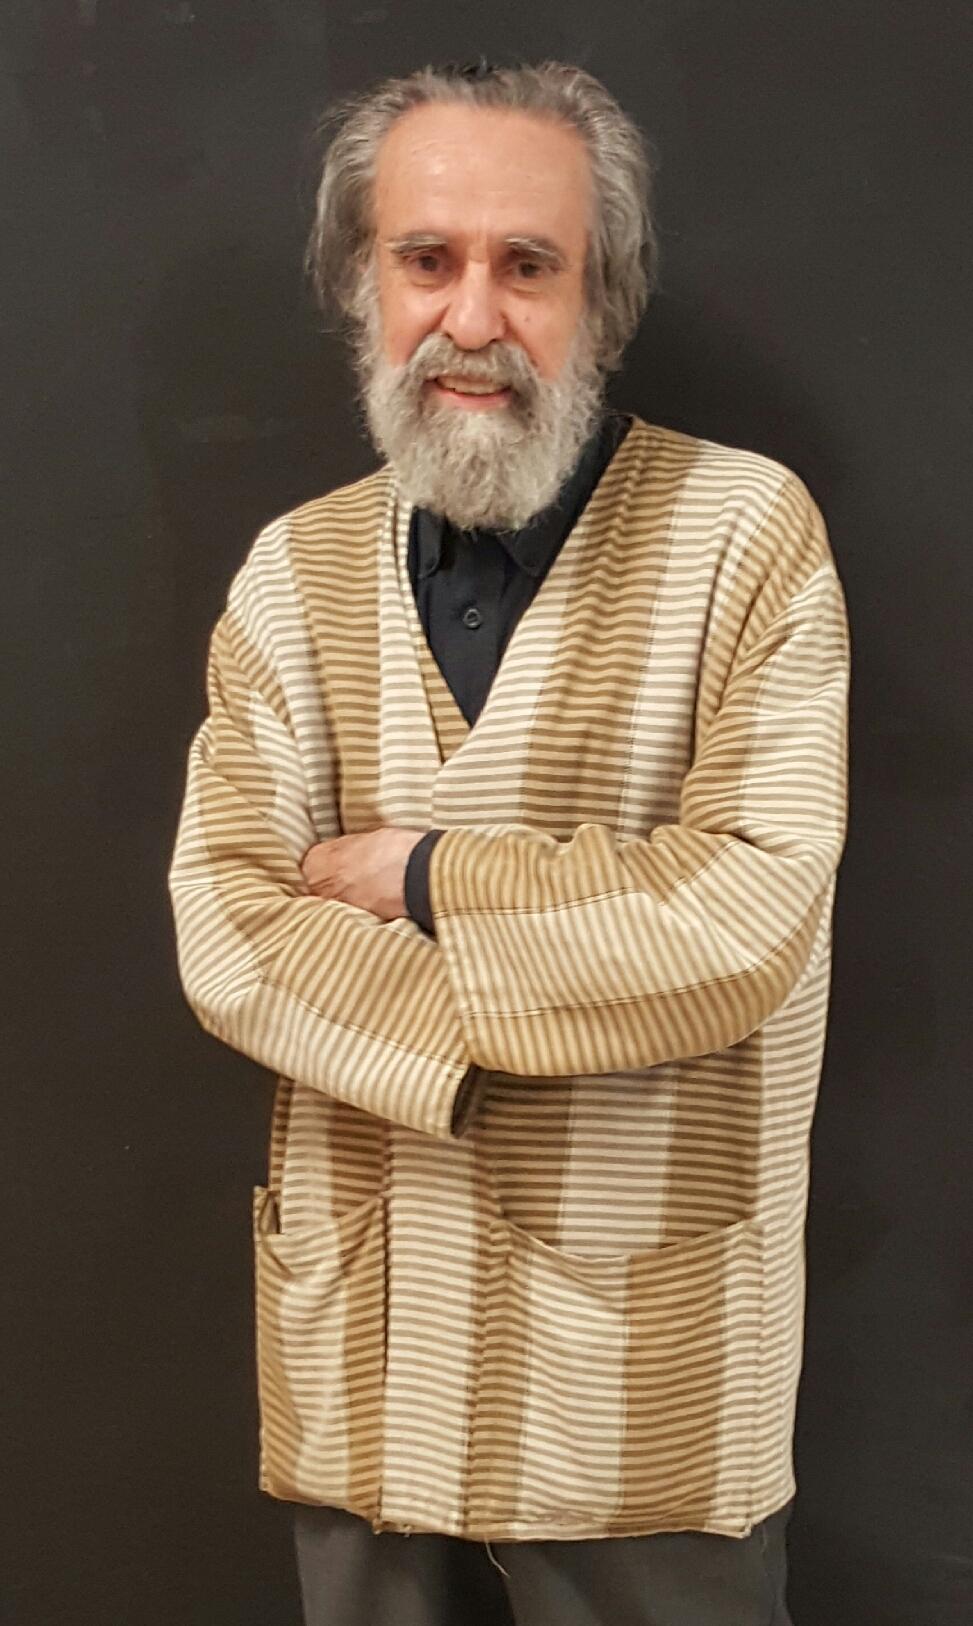 Image of Isidoro Valcárcel Medina from Wikidata